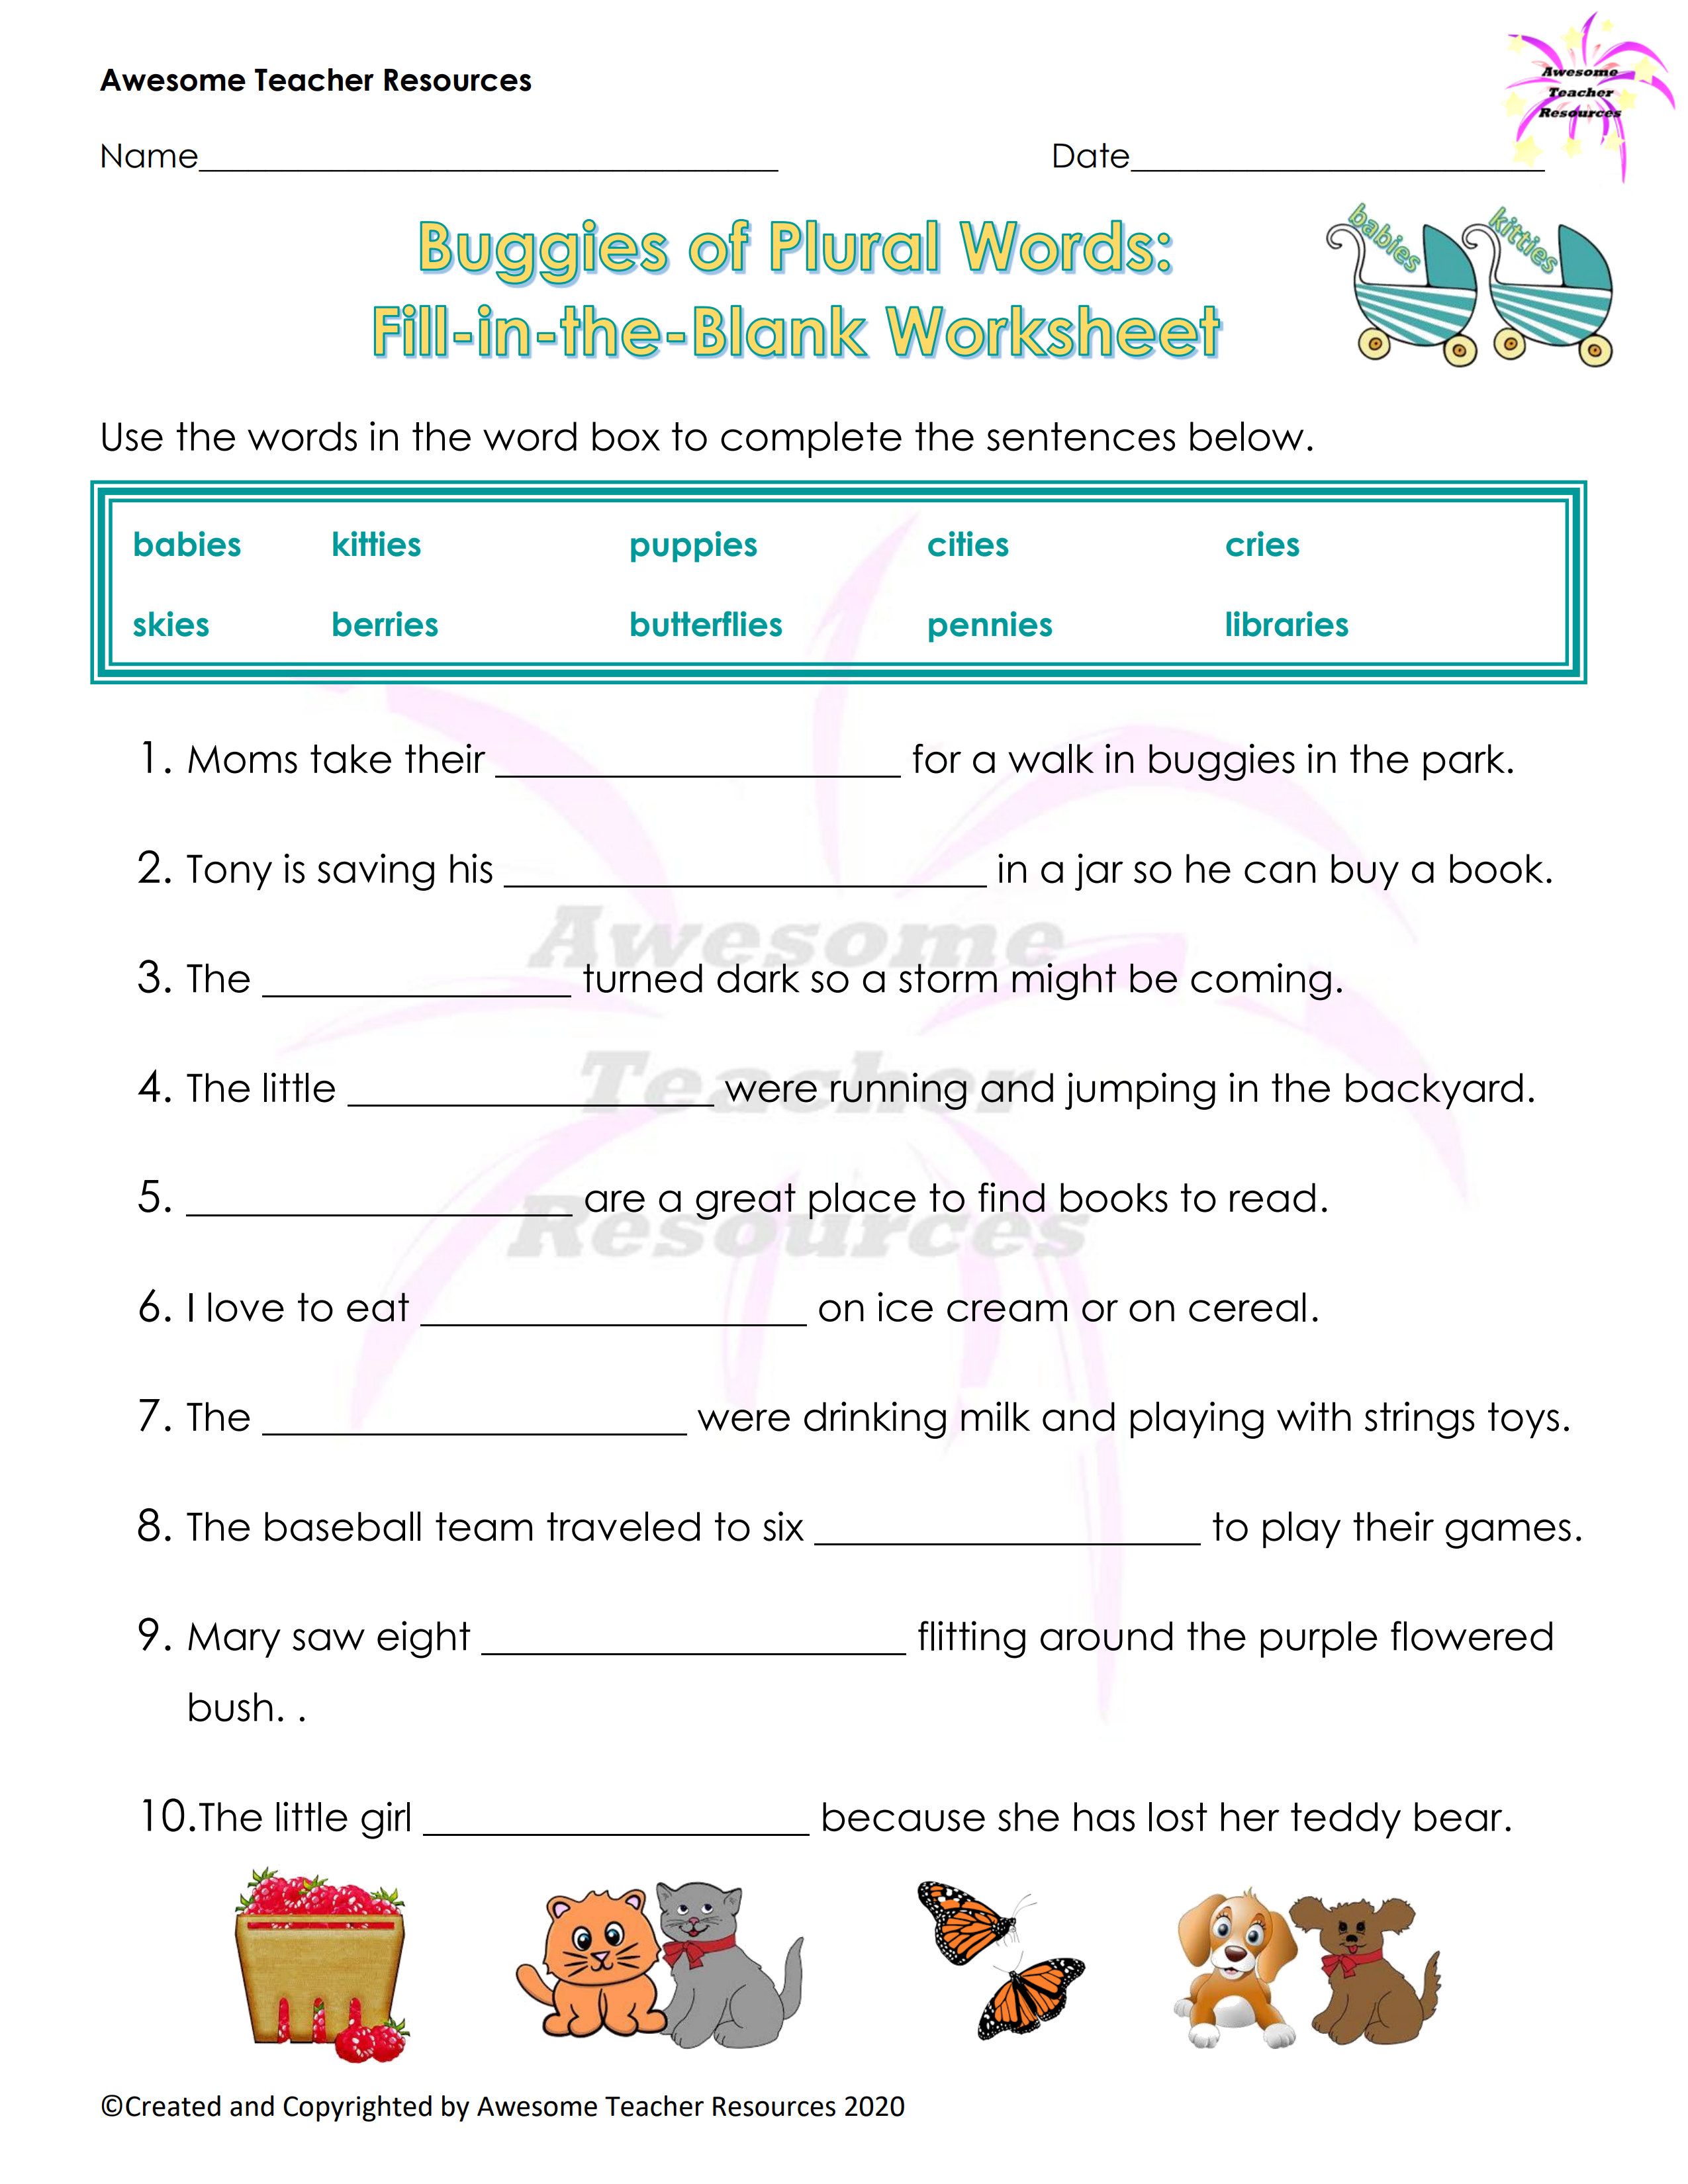 Buggies Of Plural Words Fill In The Blank Worksheet